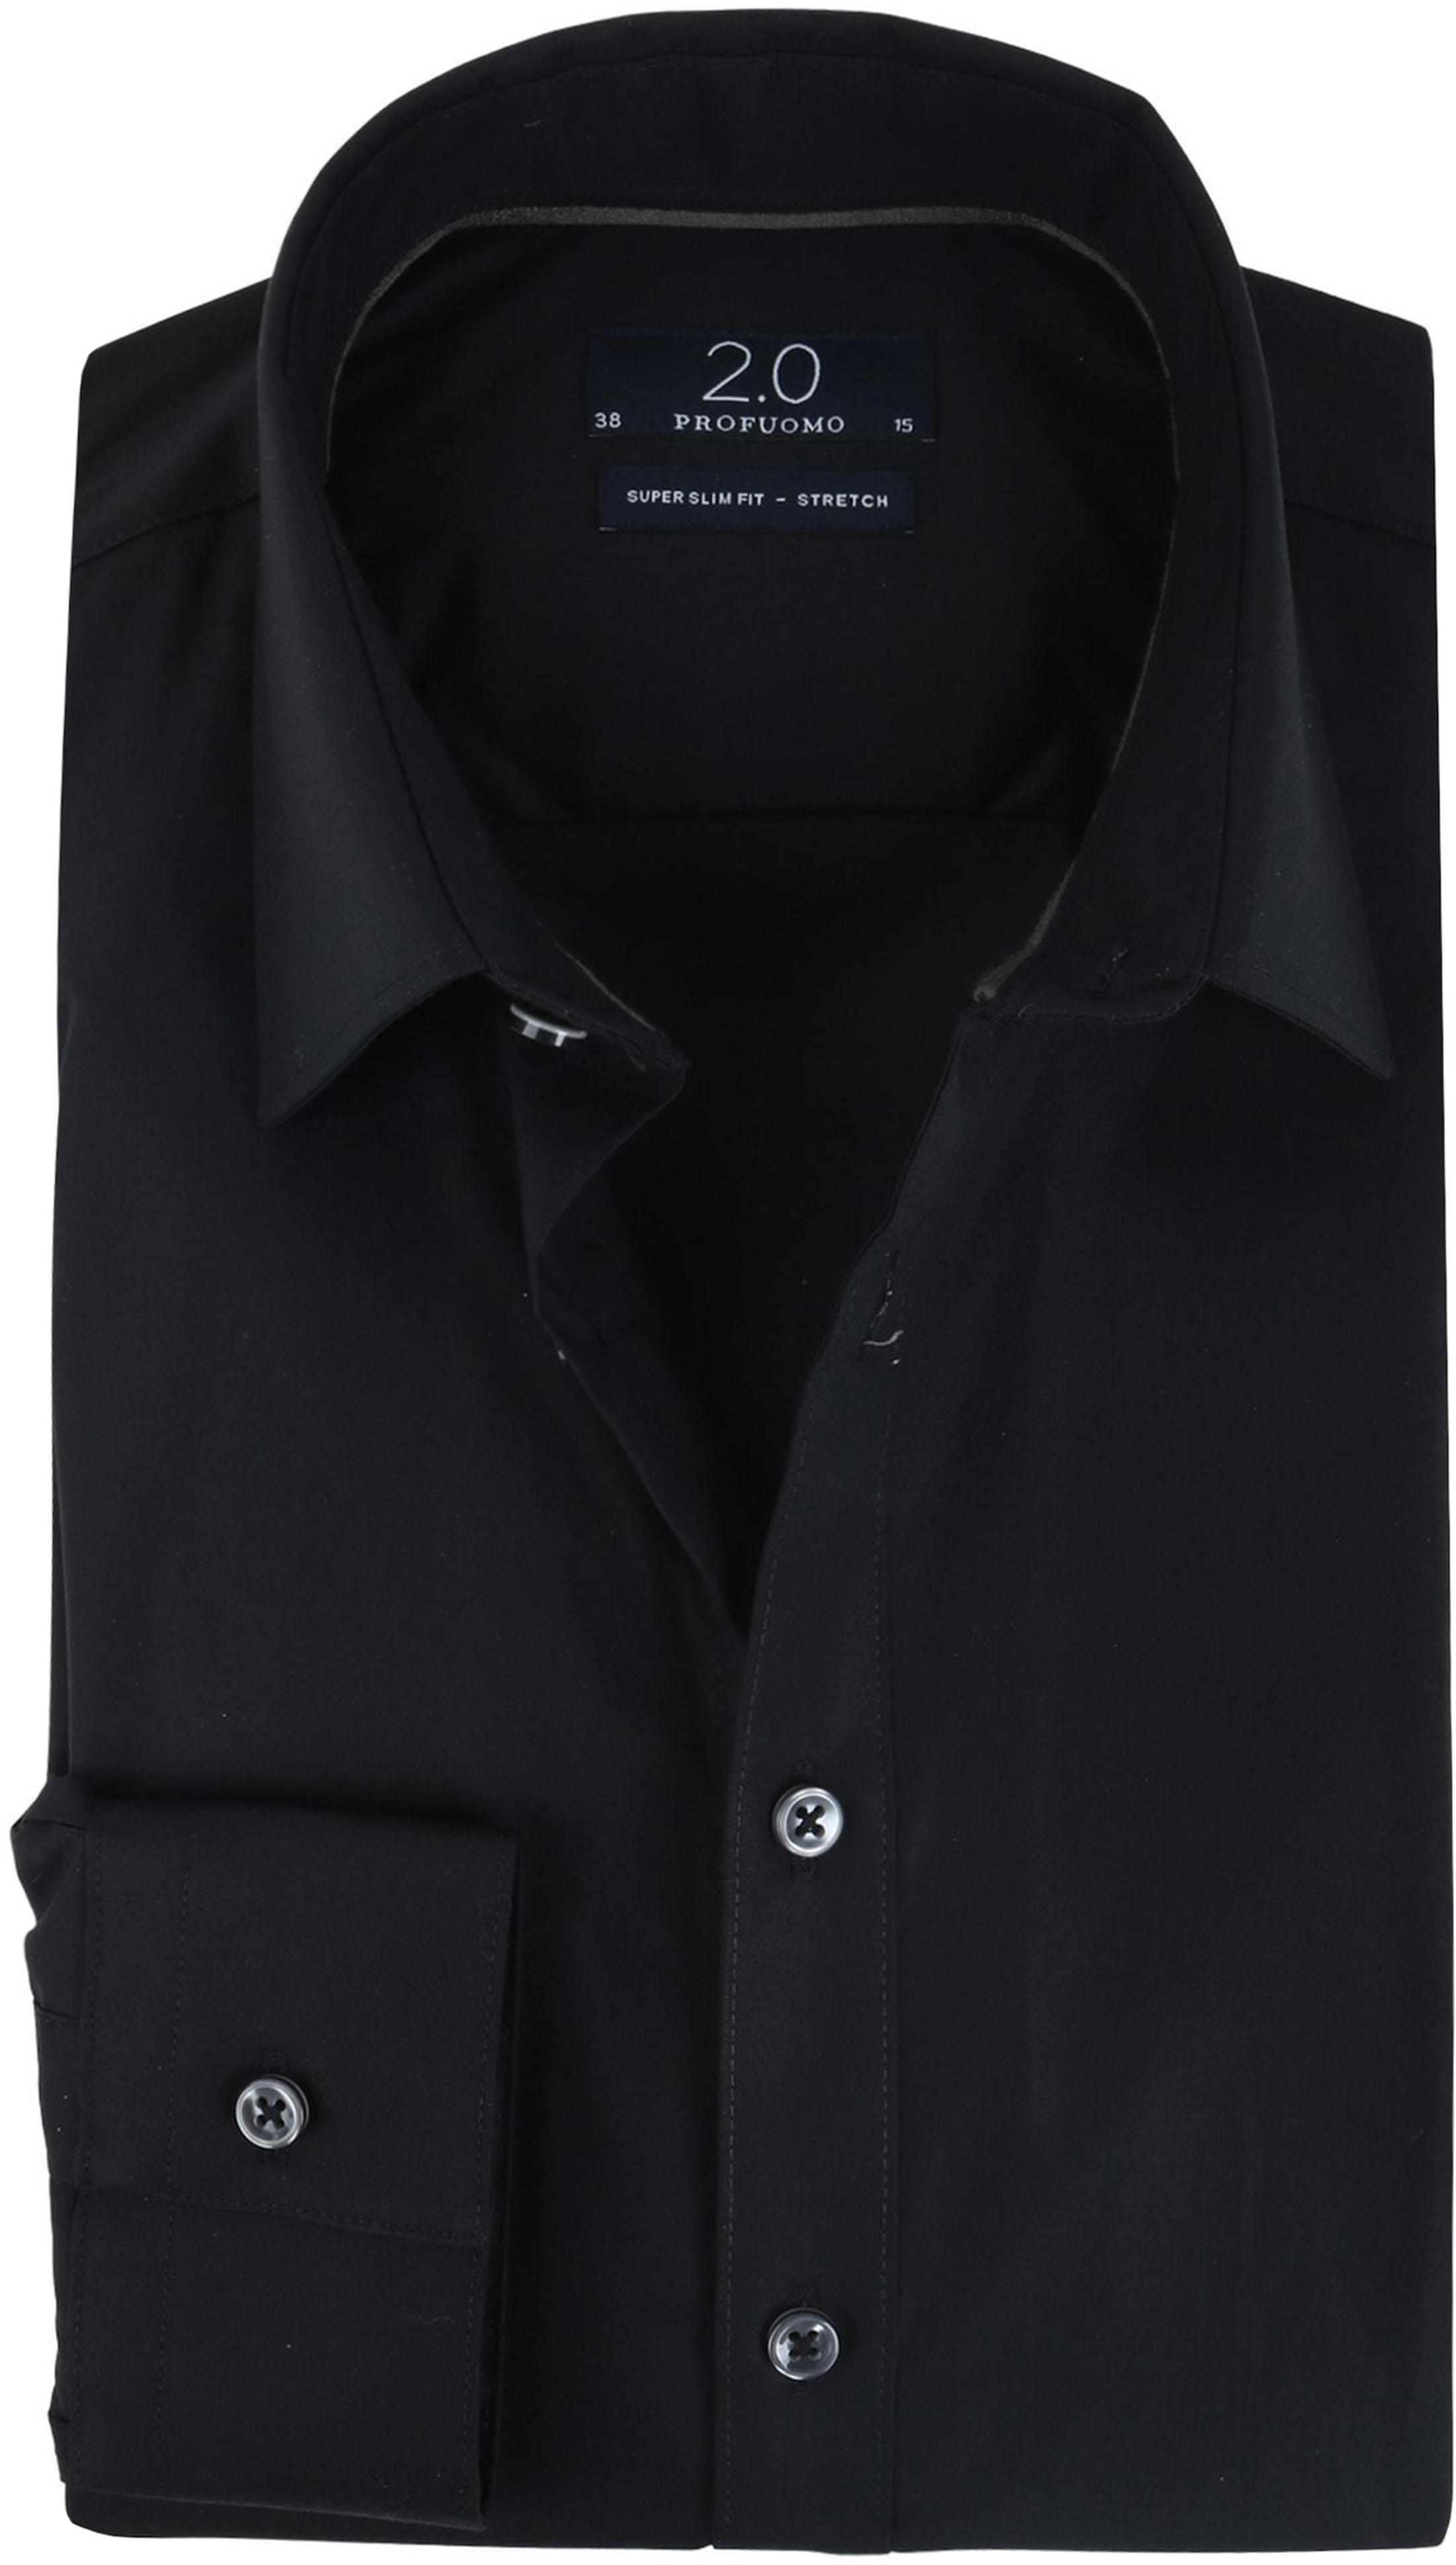 Profuomo Skinny Fit Shirt Black foto 0